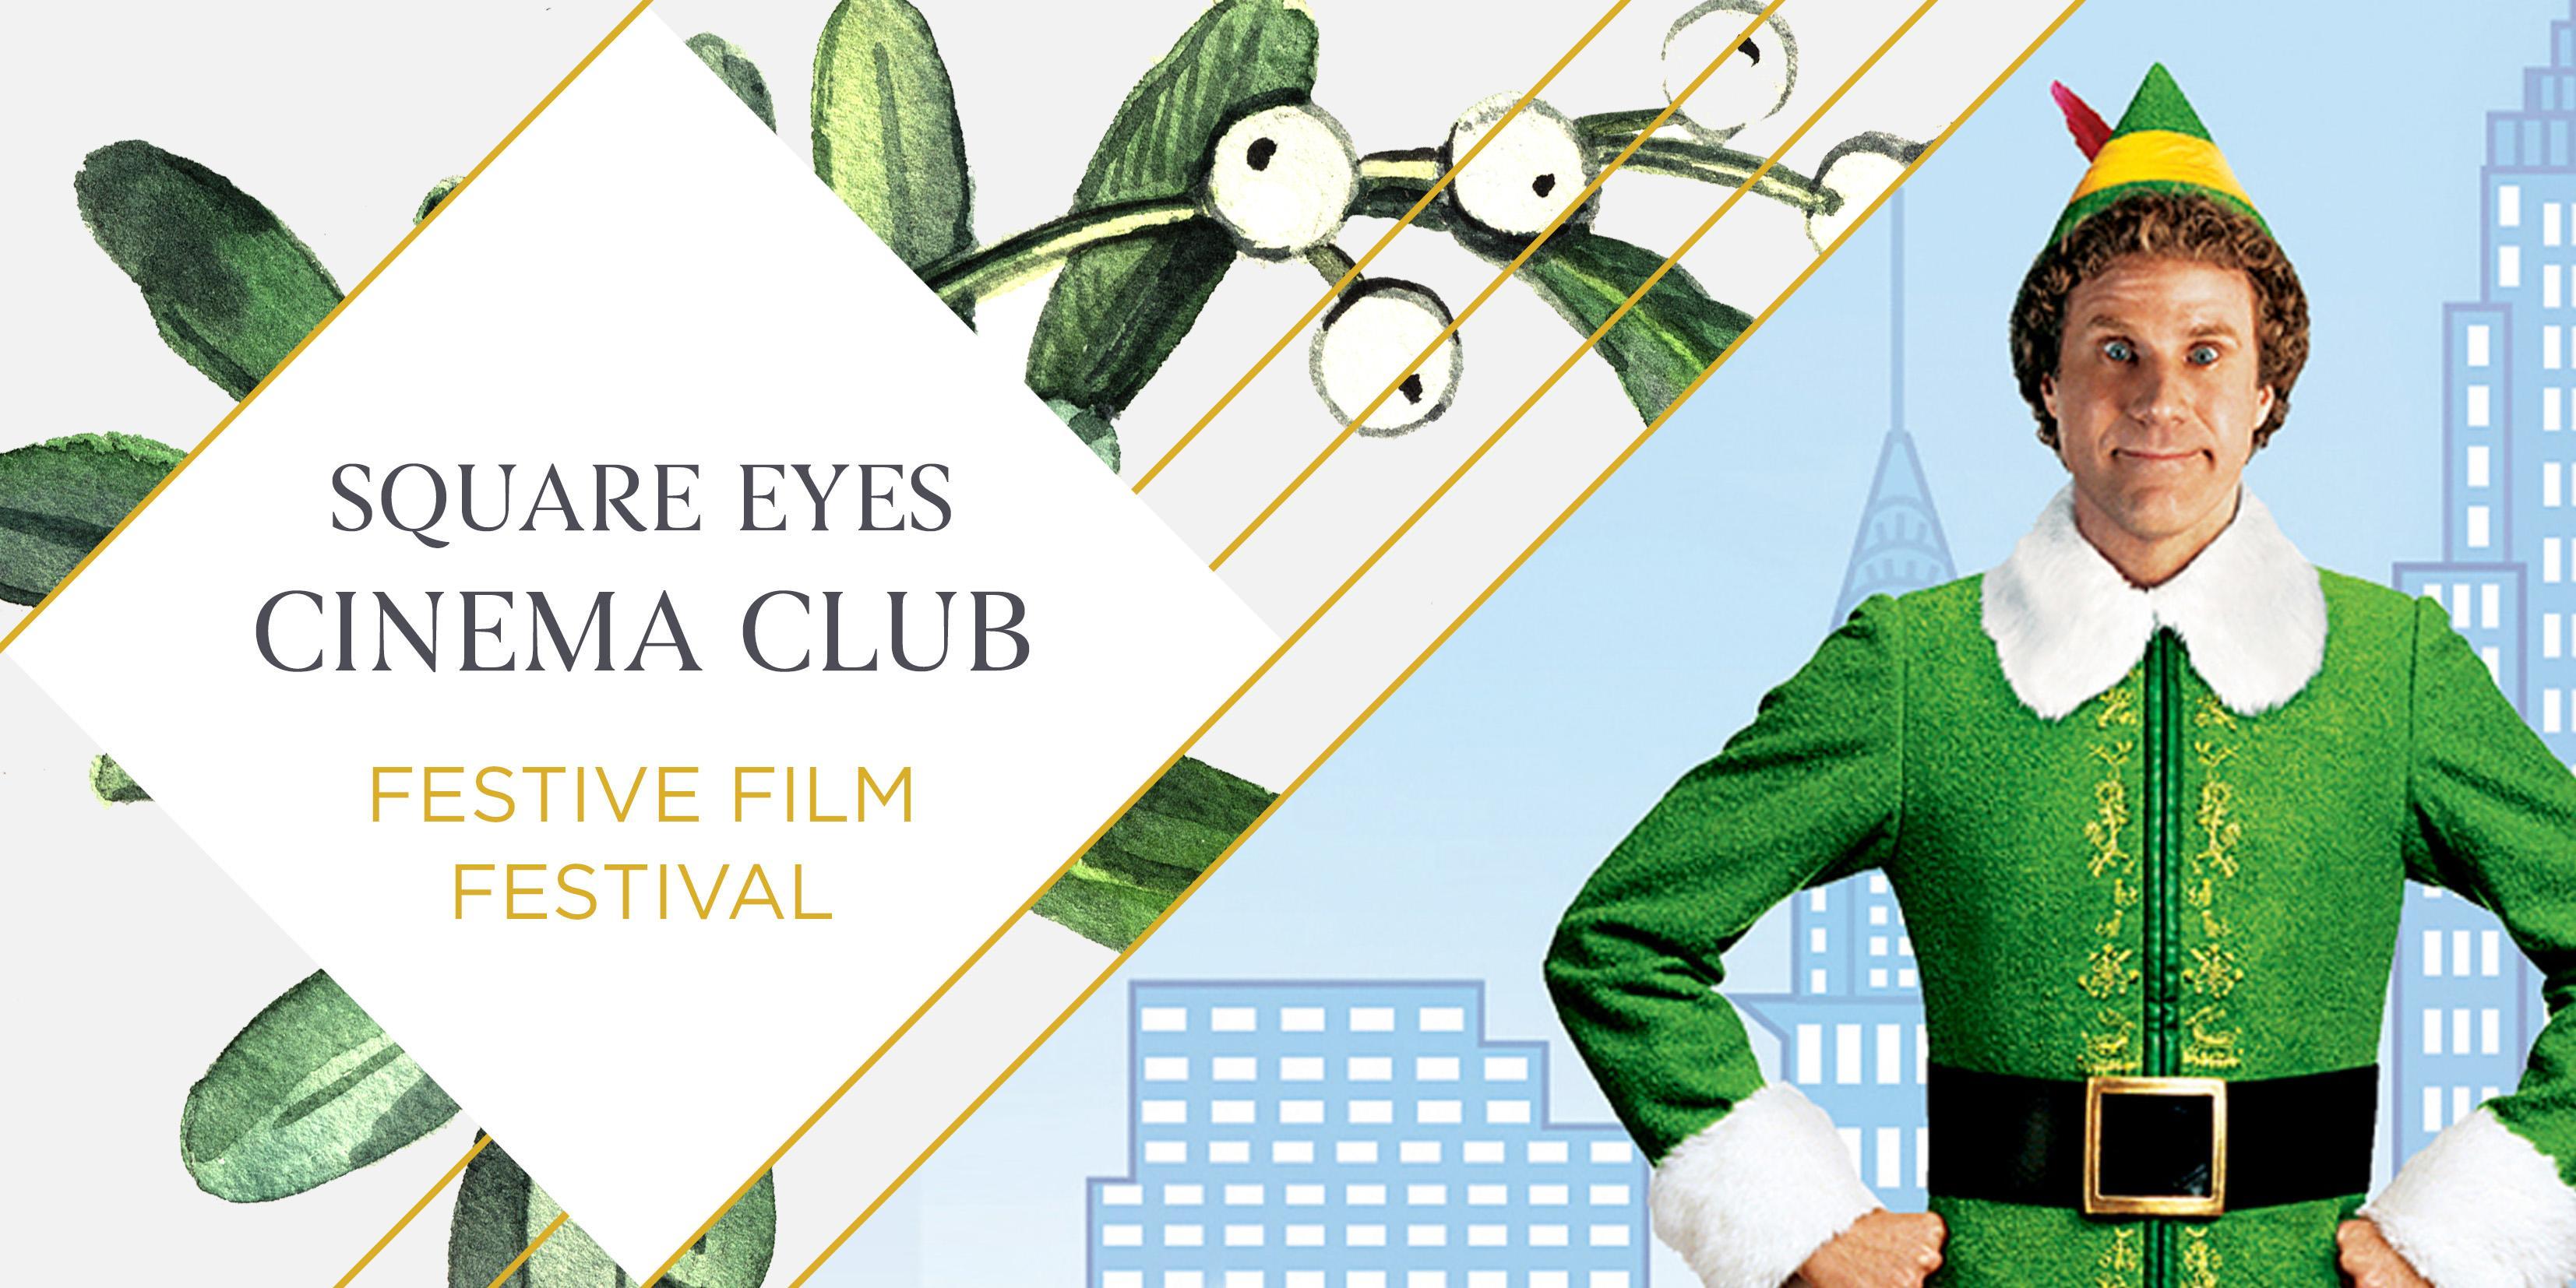 NEW Festive Square Eyes Cinema Club - Elf